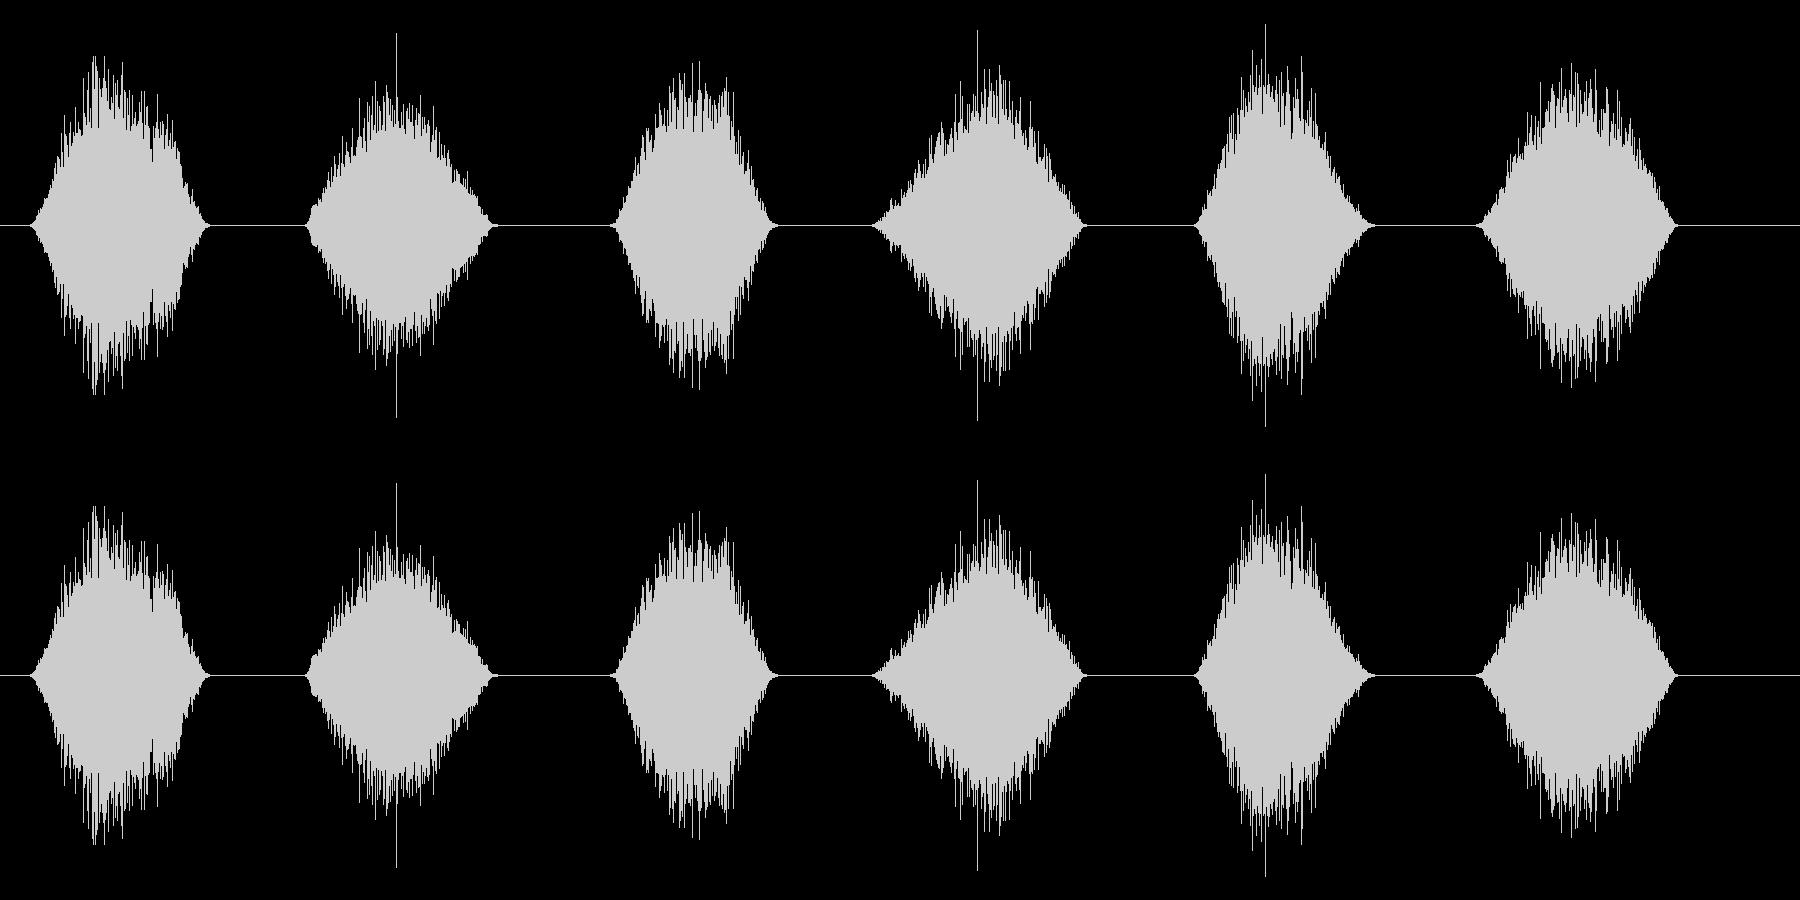 PC マウス ムーブ04-09(ソフト)の未再生の波形